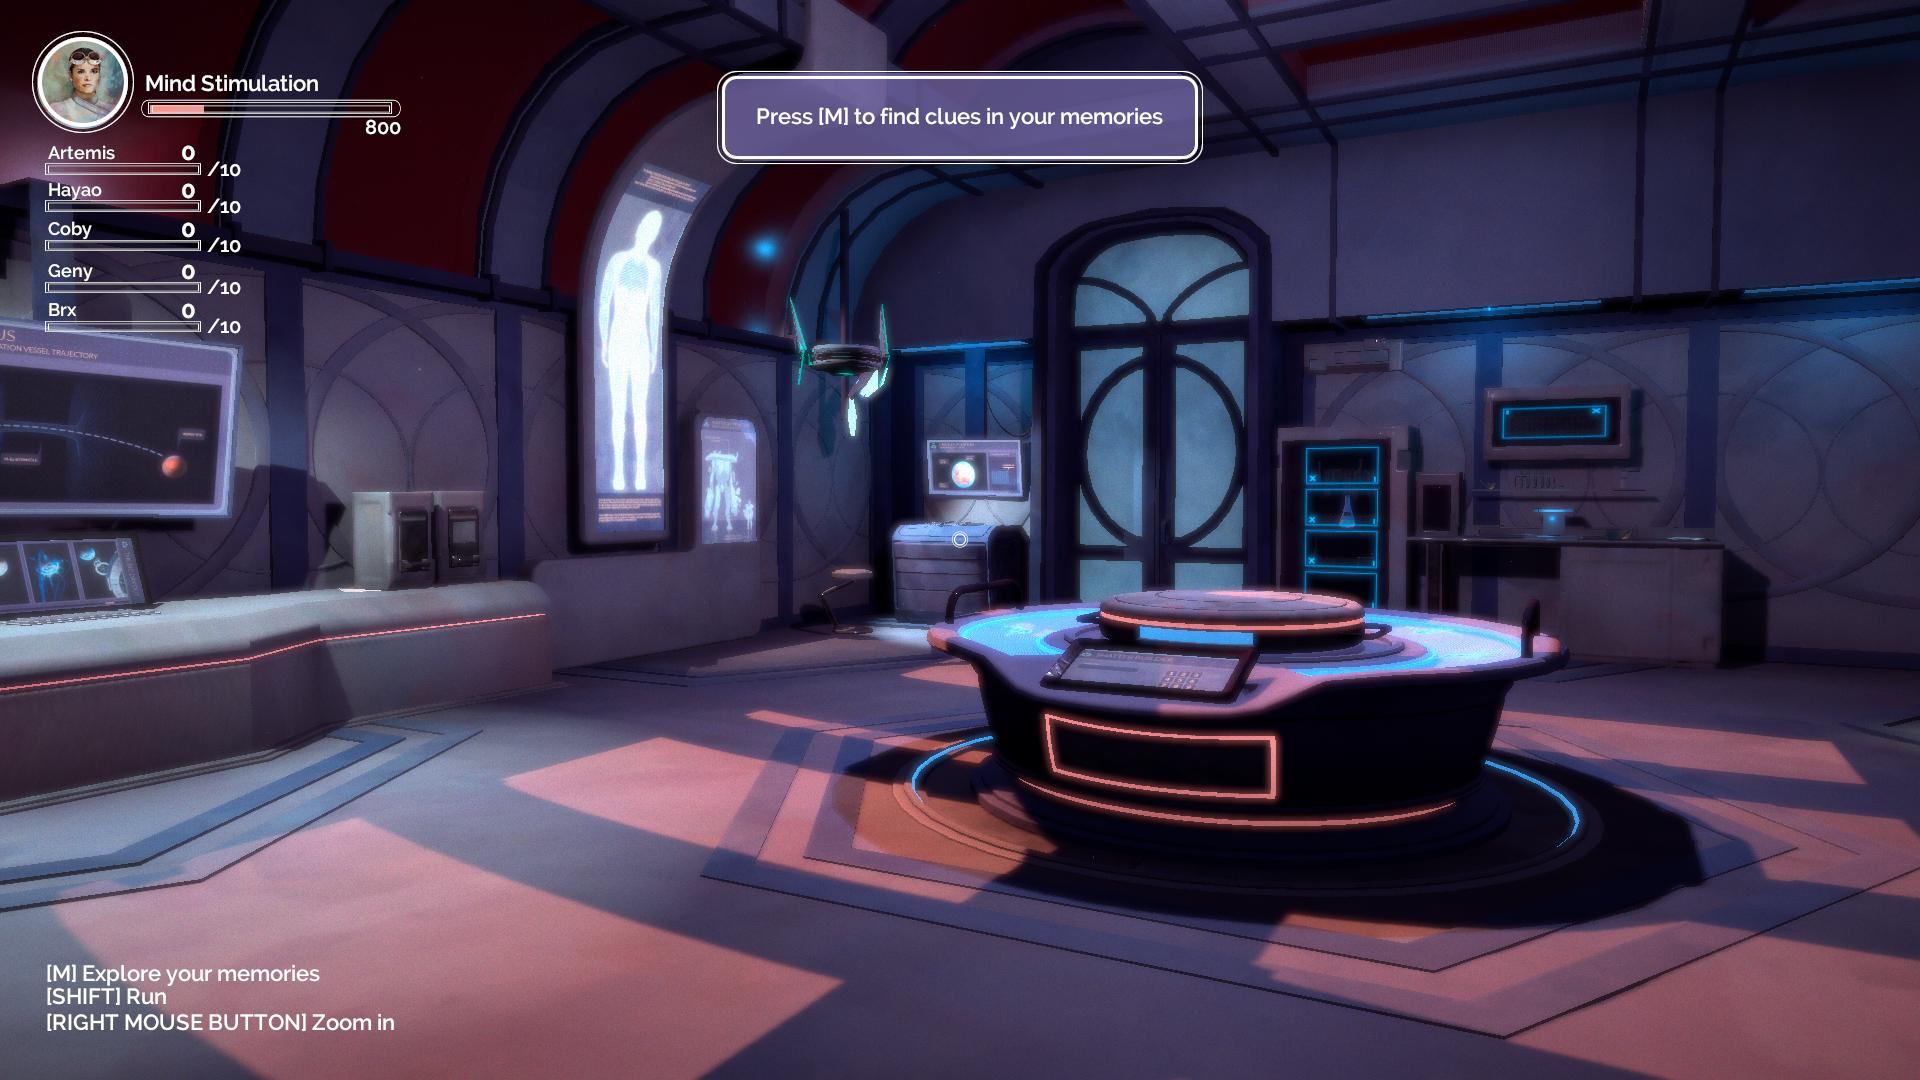 The Puzzle Room from Primus Vita demo 1.5